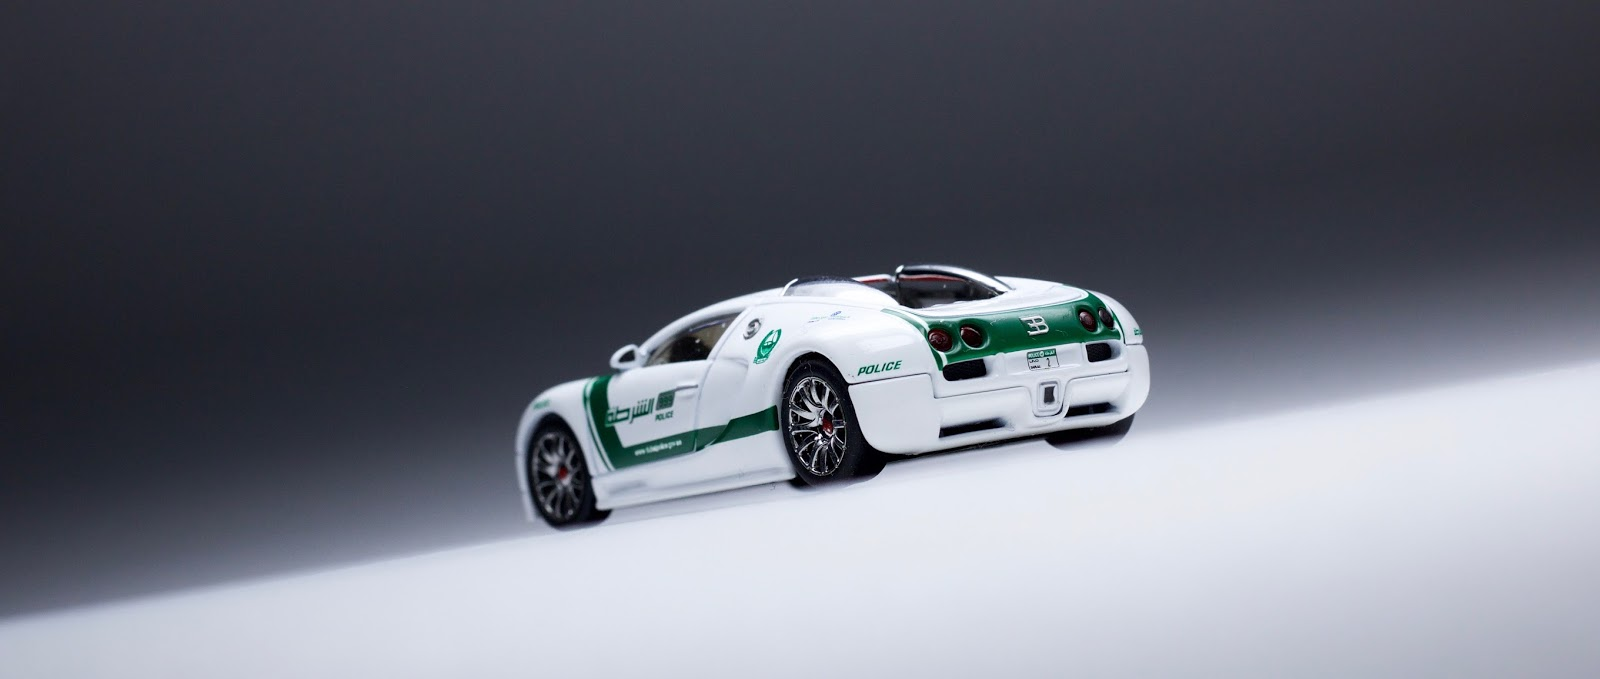 The Auto Art Bugatti Veyron Dubai Police Car Is Upper Echelon Diecast Lamleygroup